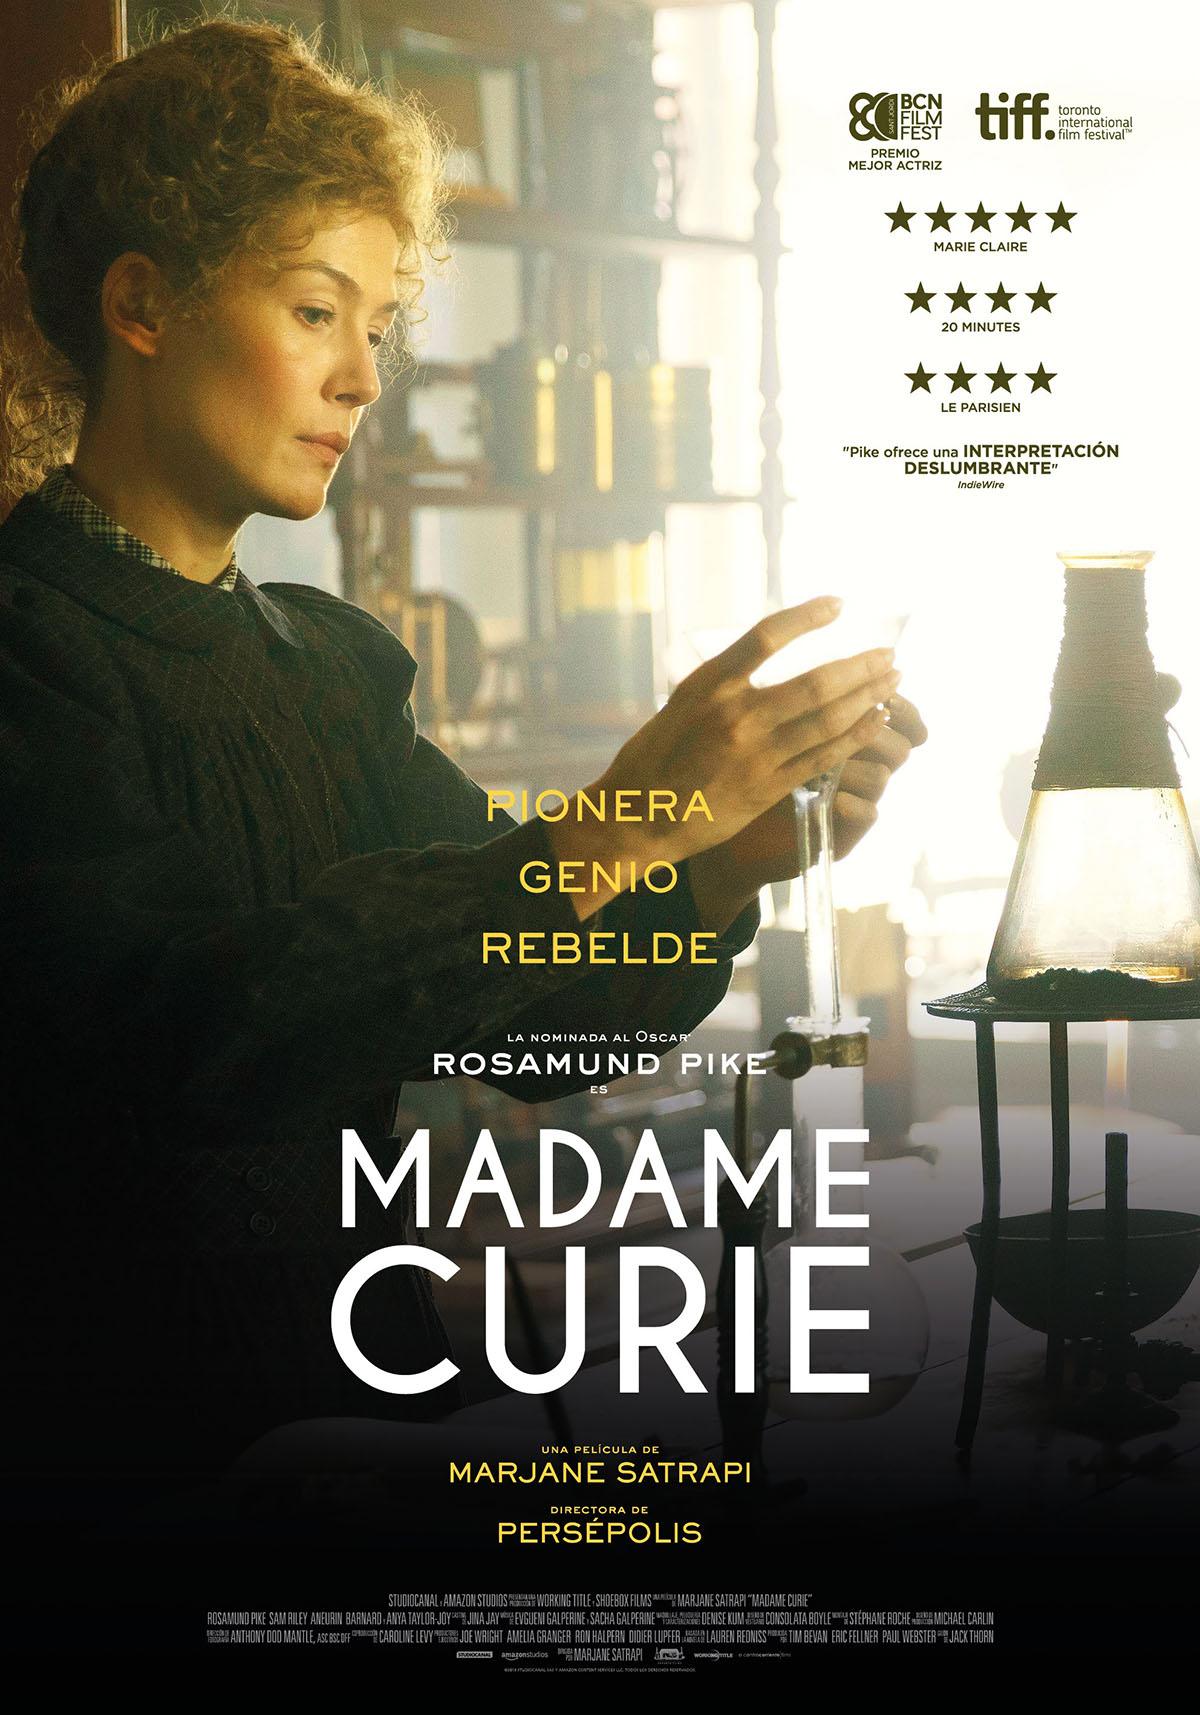 'Madame Curie'